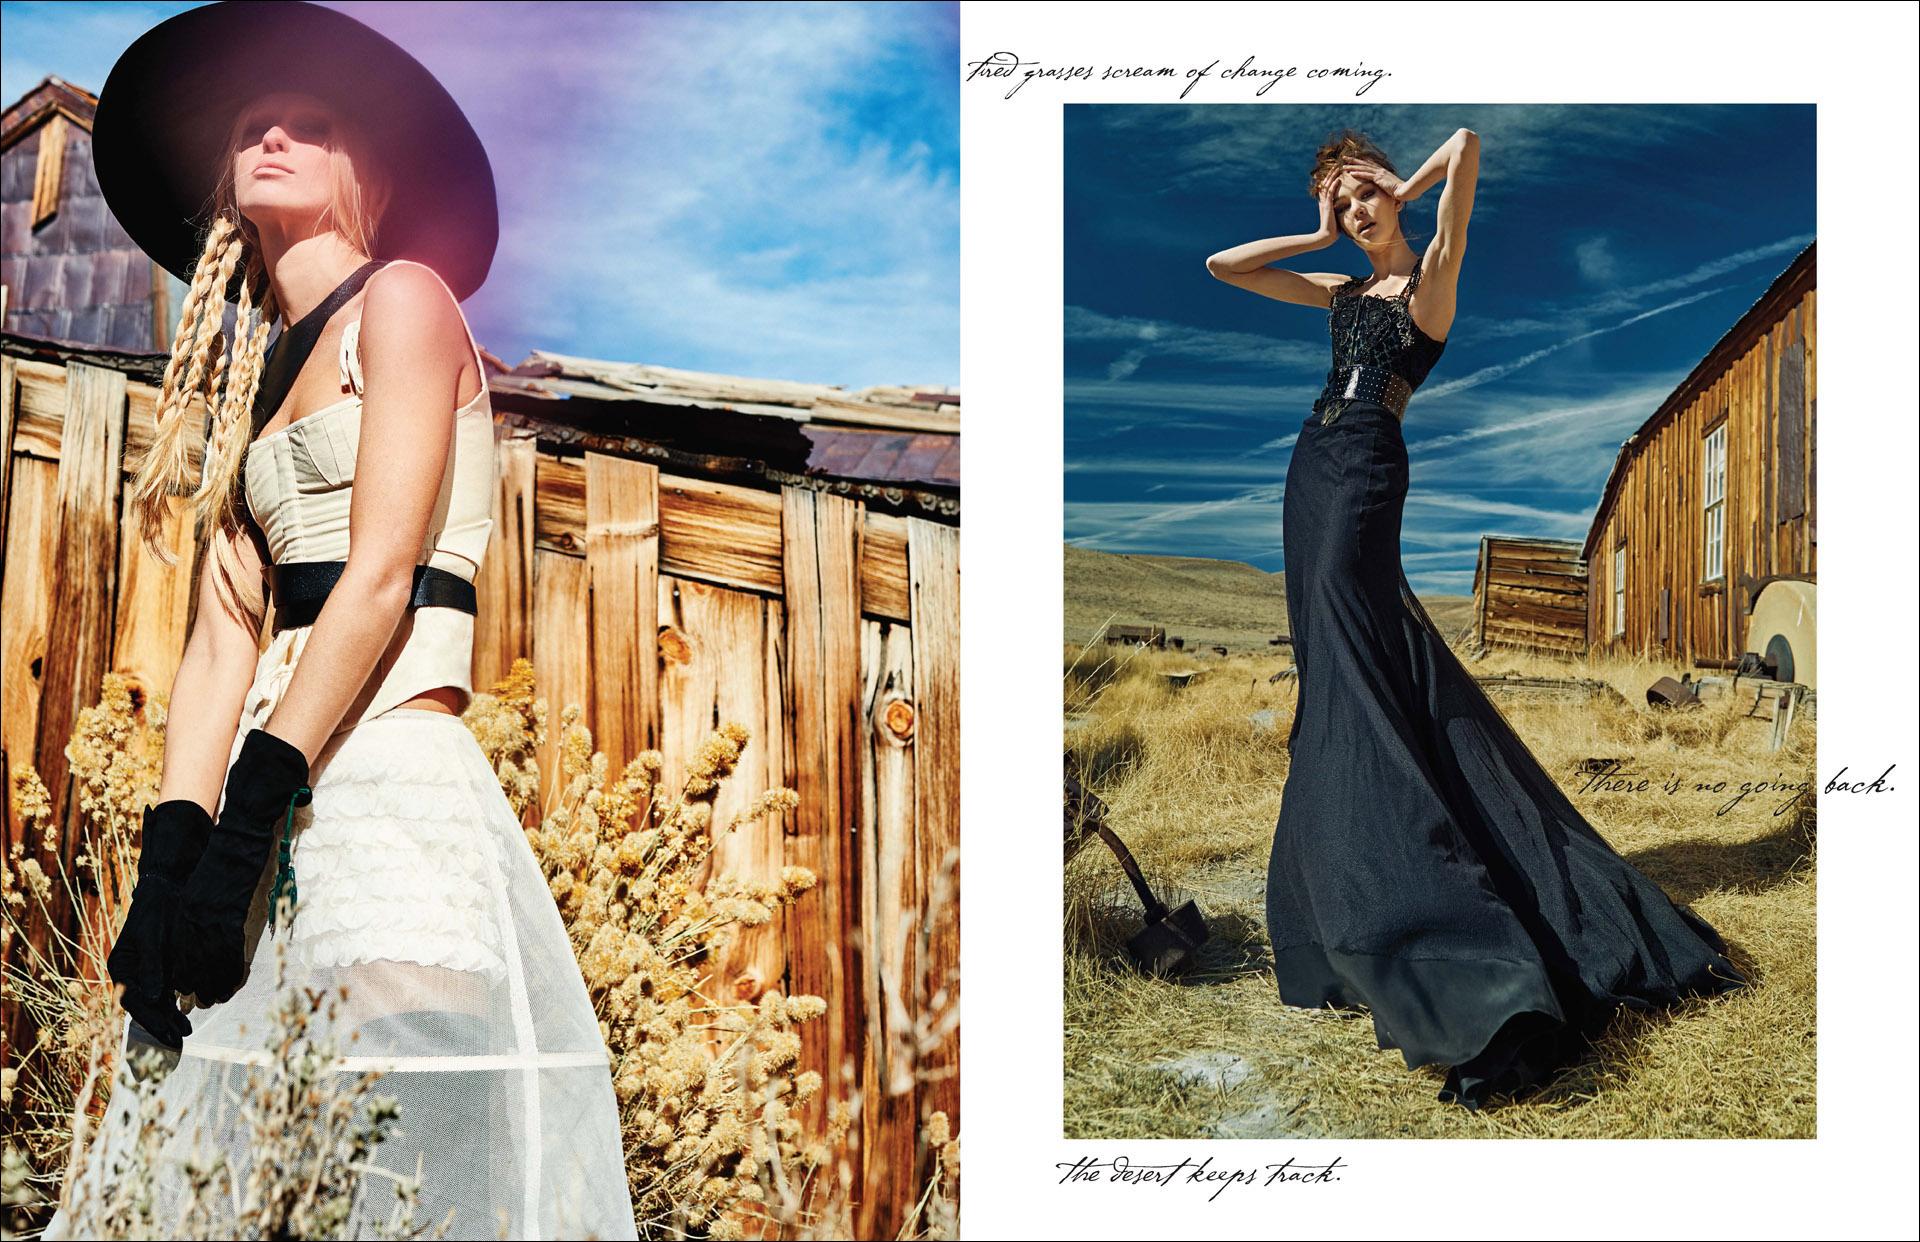 Spirit-&-Flesh-Magazine_LAS-DESPERADAS_by_MEG-WEBSTER_and_ATHANASIA-NICHOLS_005